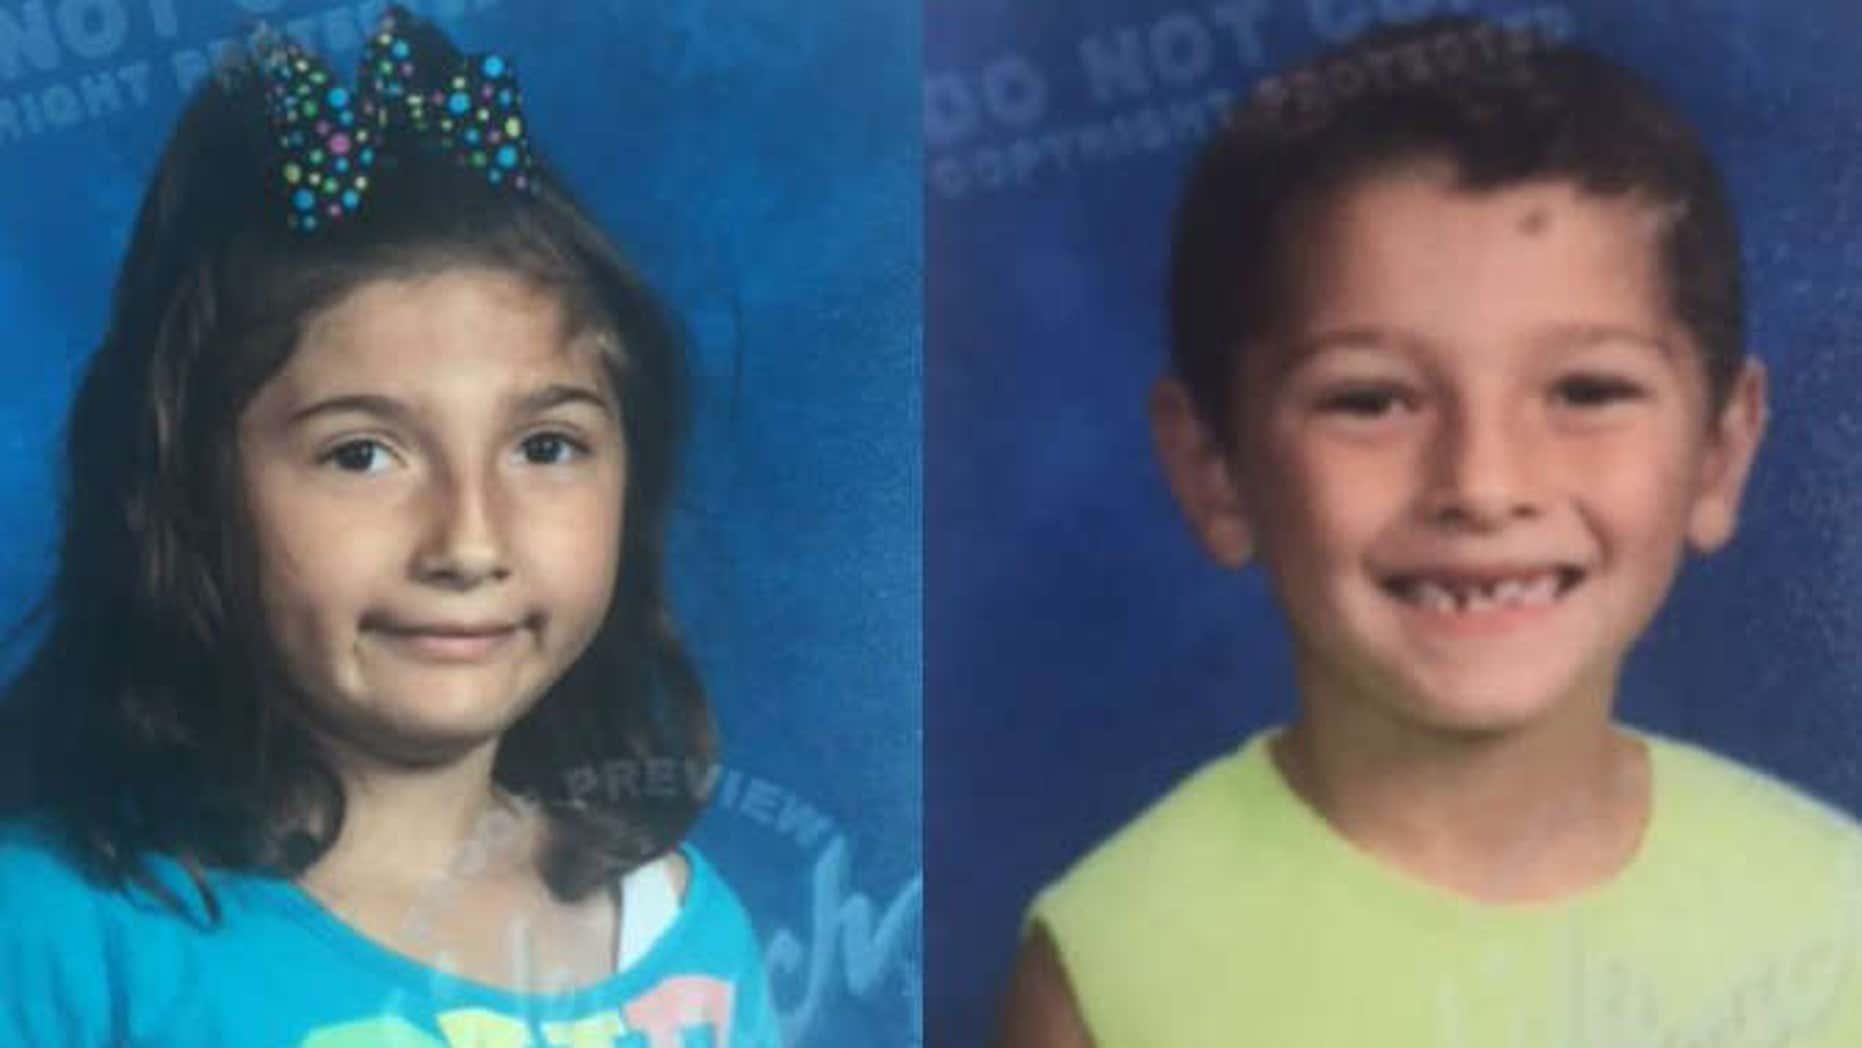 Lillana Hernandez, 7, and Rene Pasztor, 6.